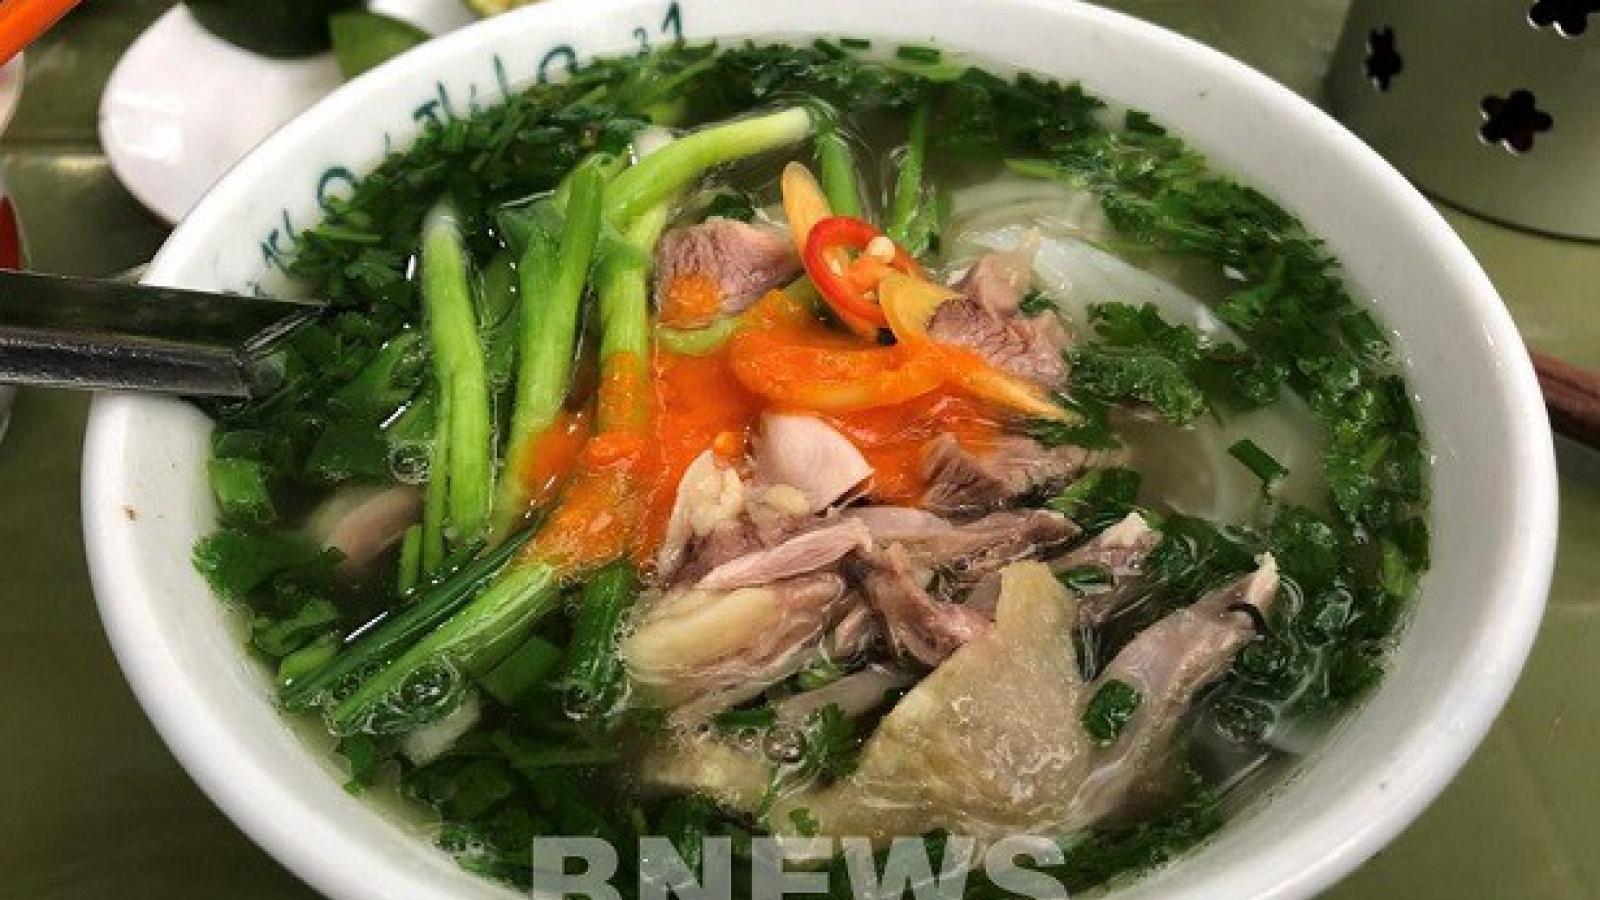 Day of Pho honors Vietnamese culinary treasure